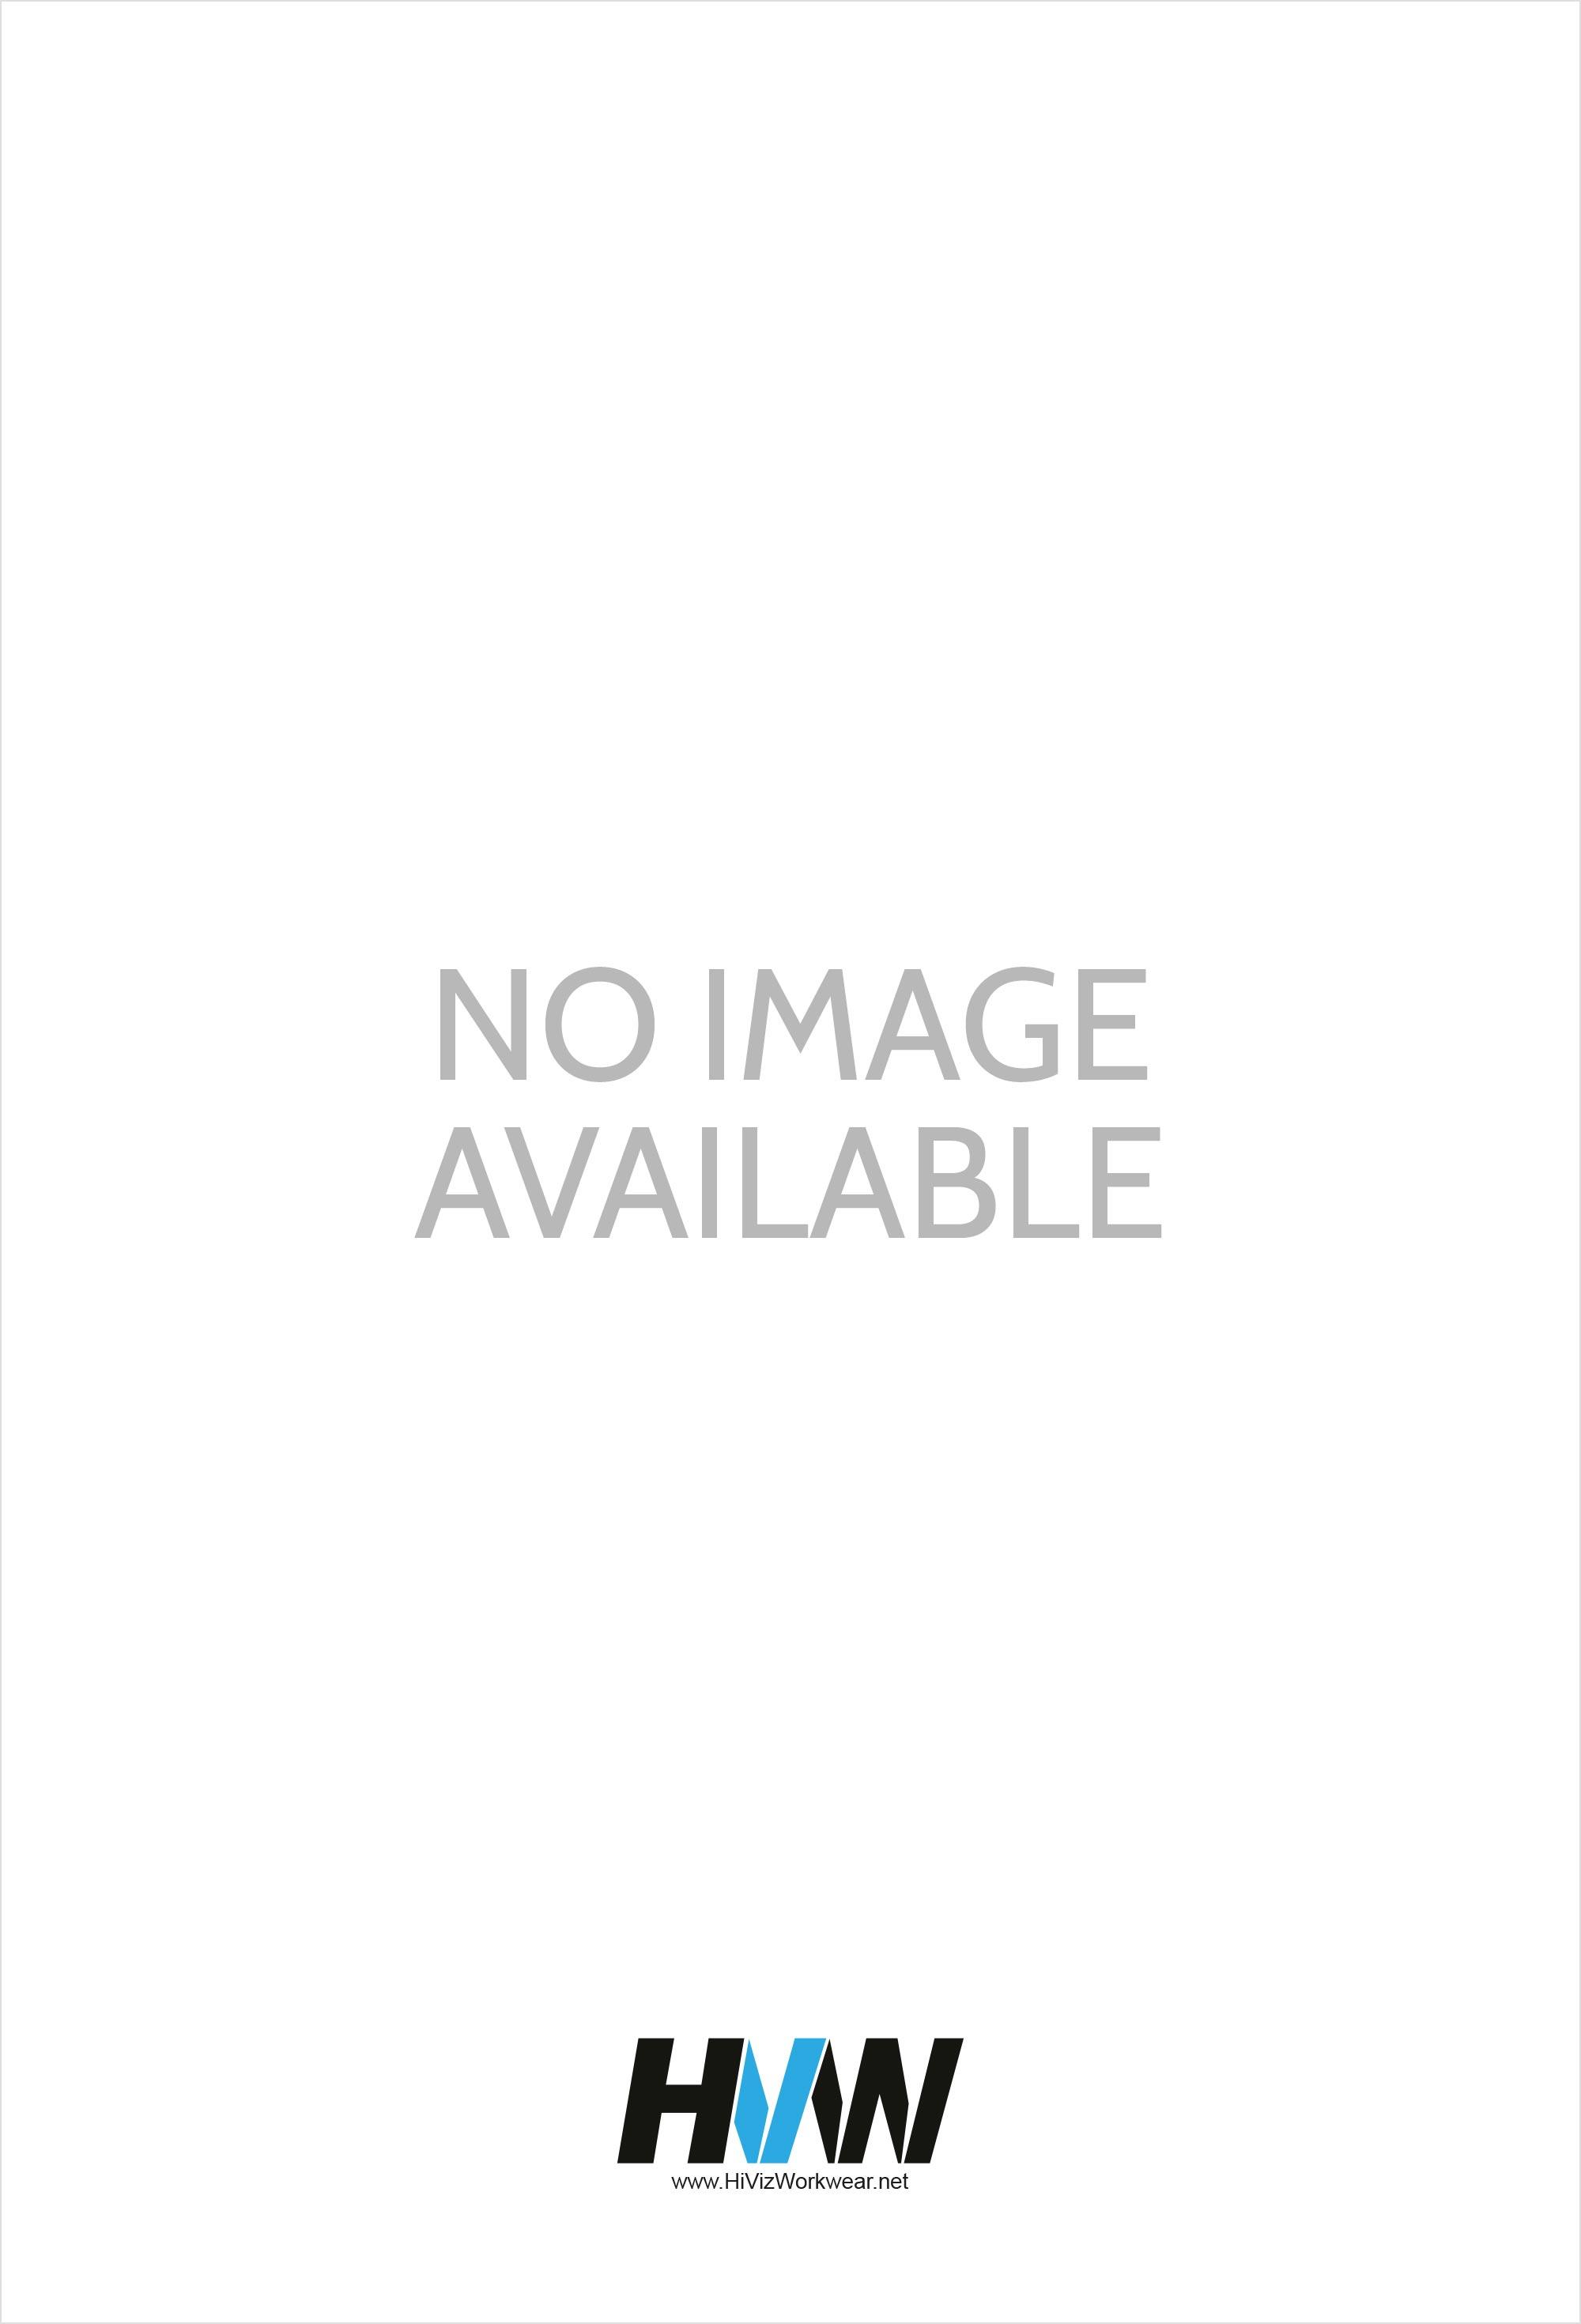 Premier PR209 Supreme Poplin Short Sleeve Shirt  (Collar Size 14.5 To 19.0)